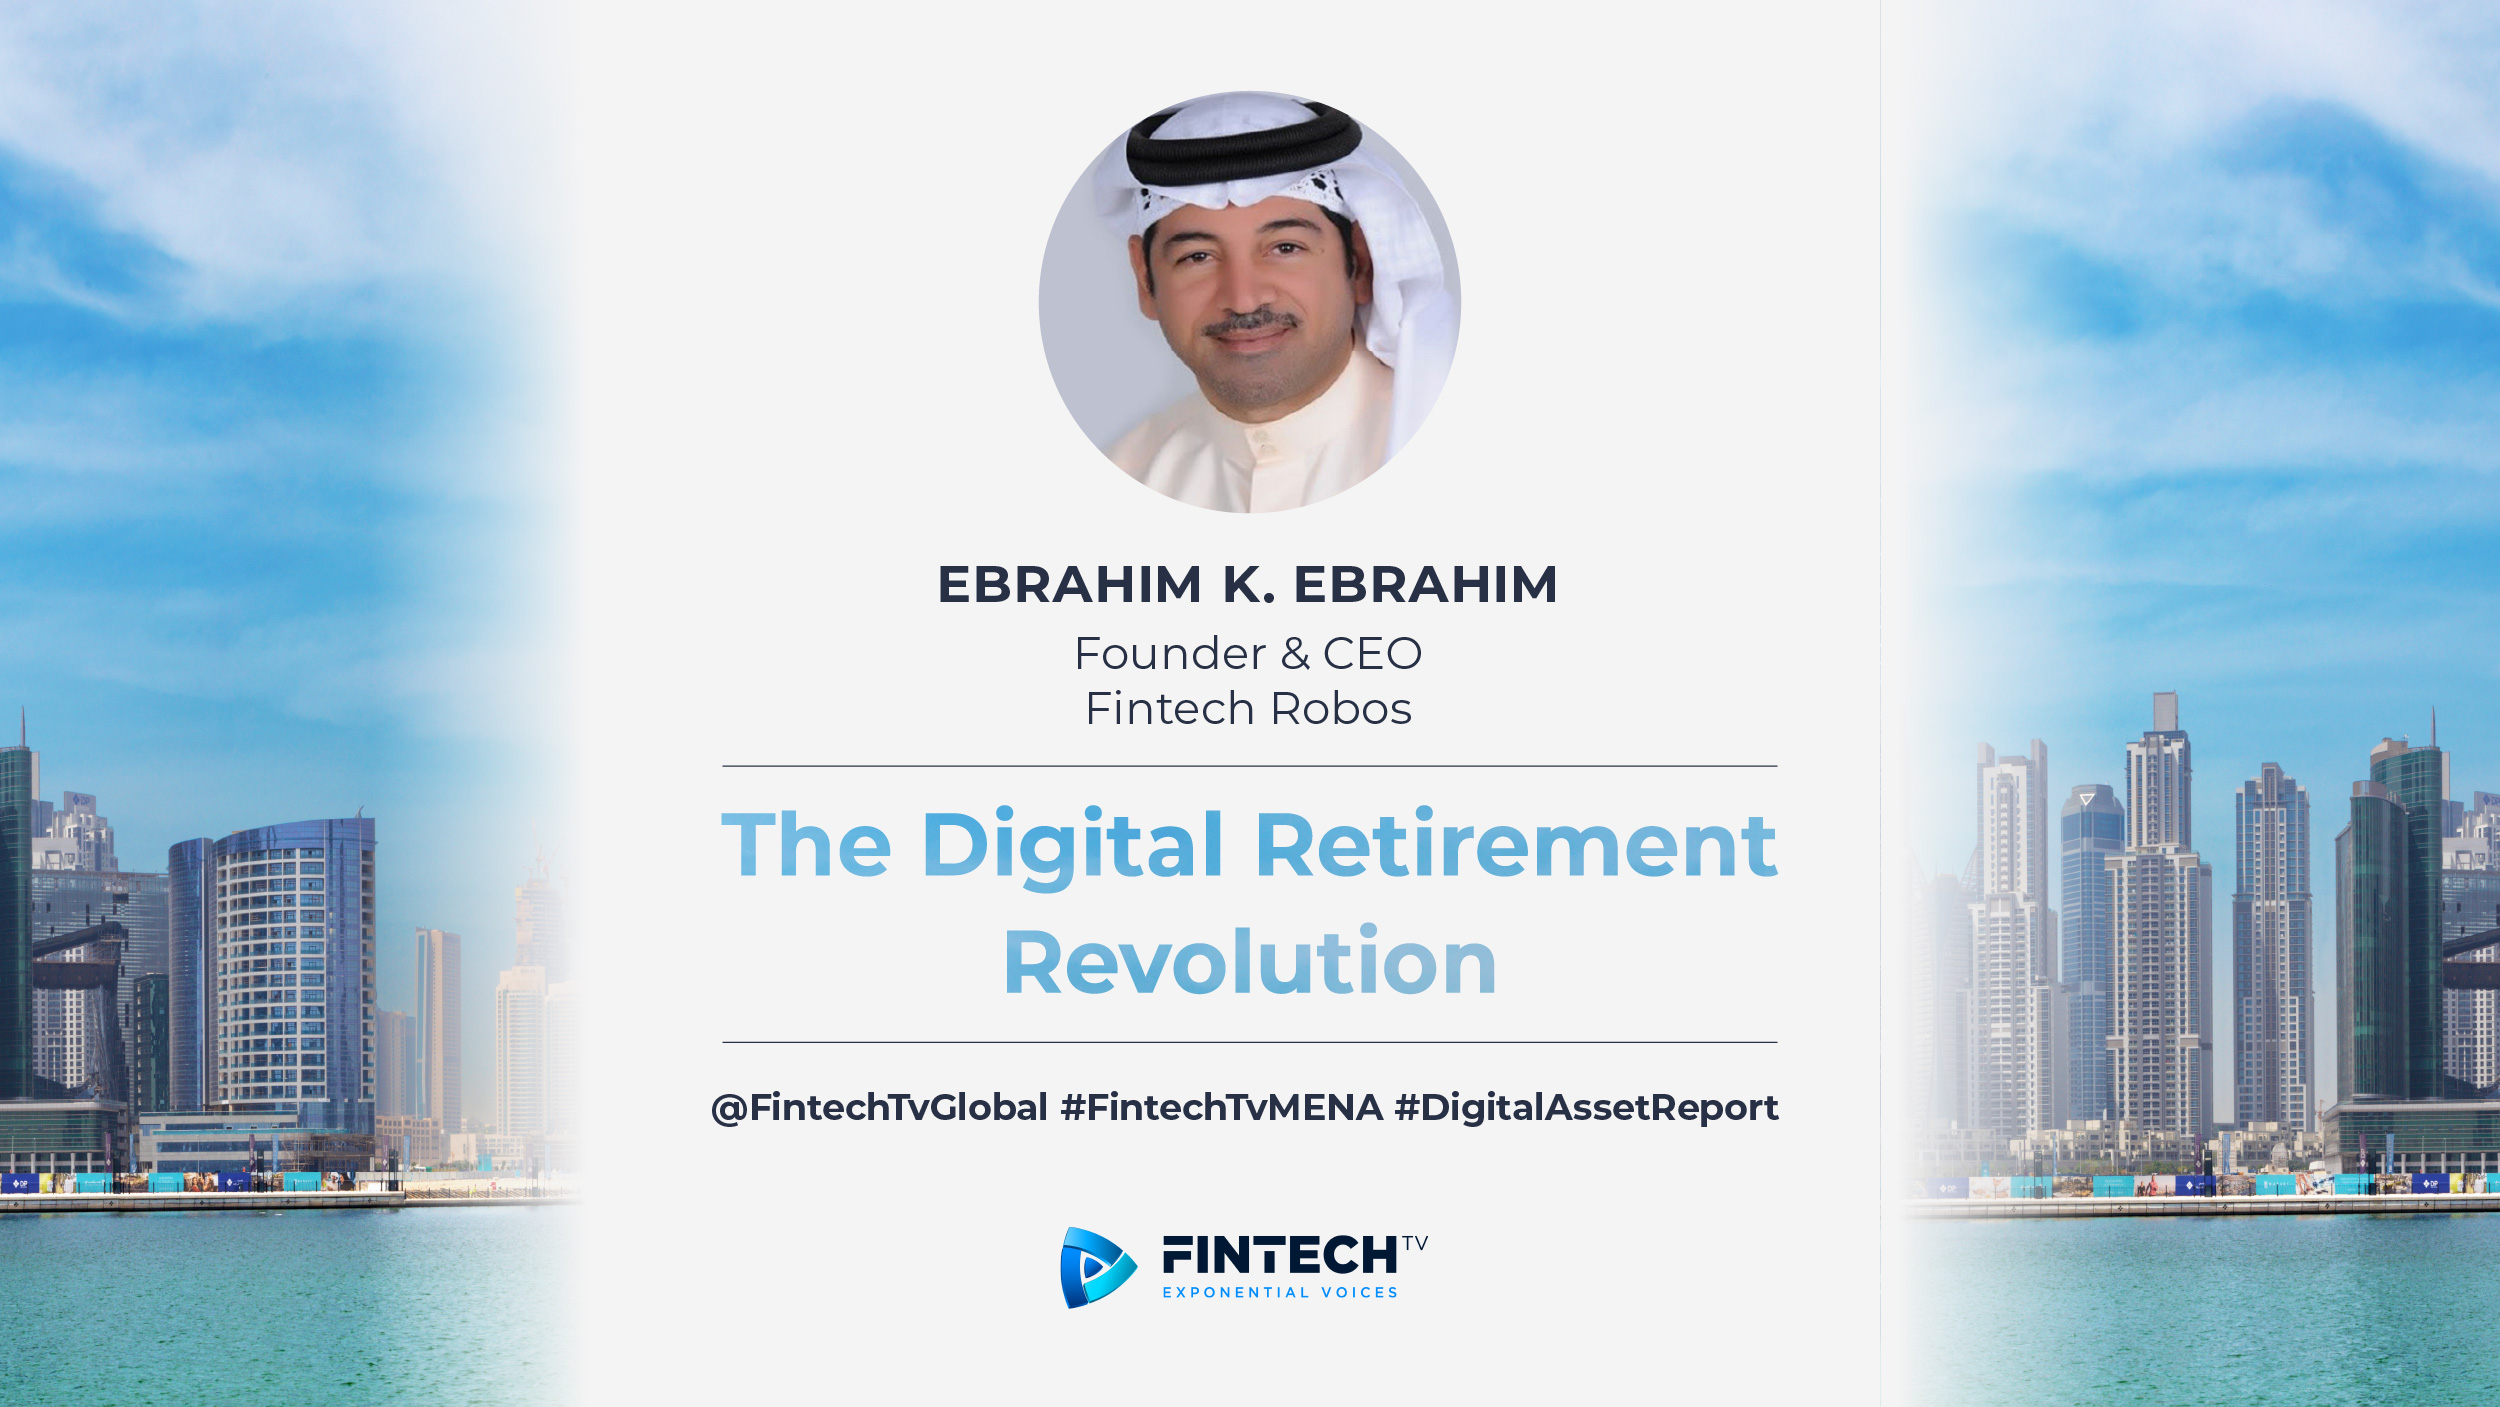 Ebrahim K. Ebrahim - Founder & CEO - Fintech Robos